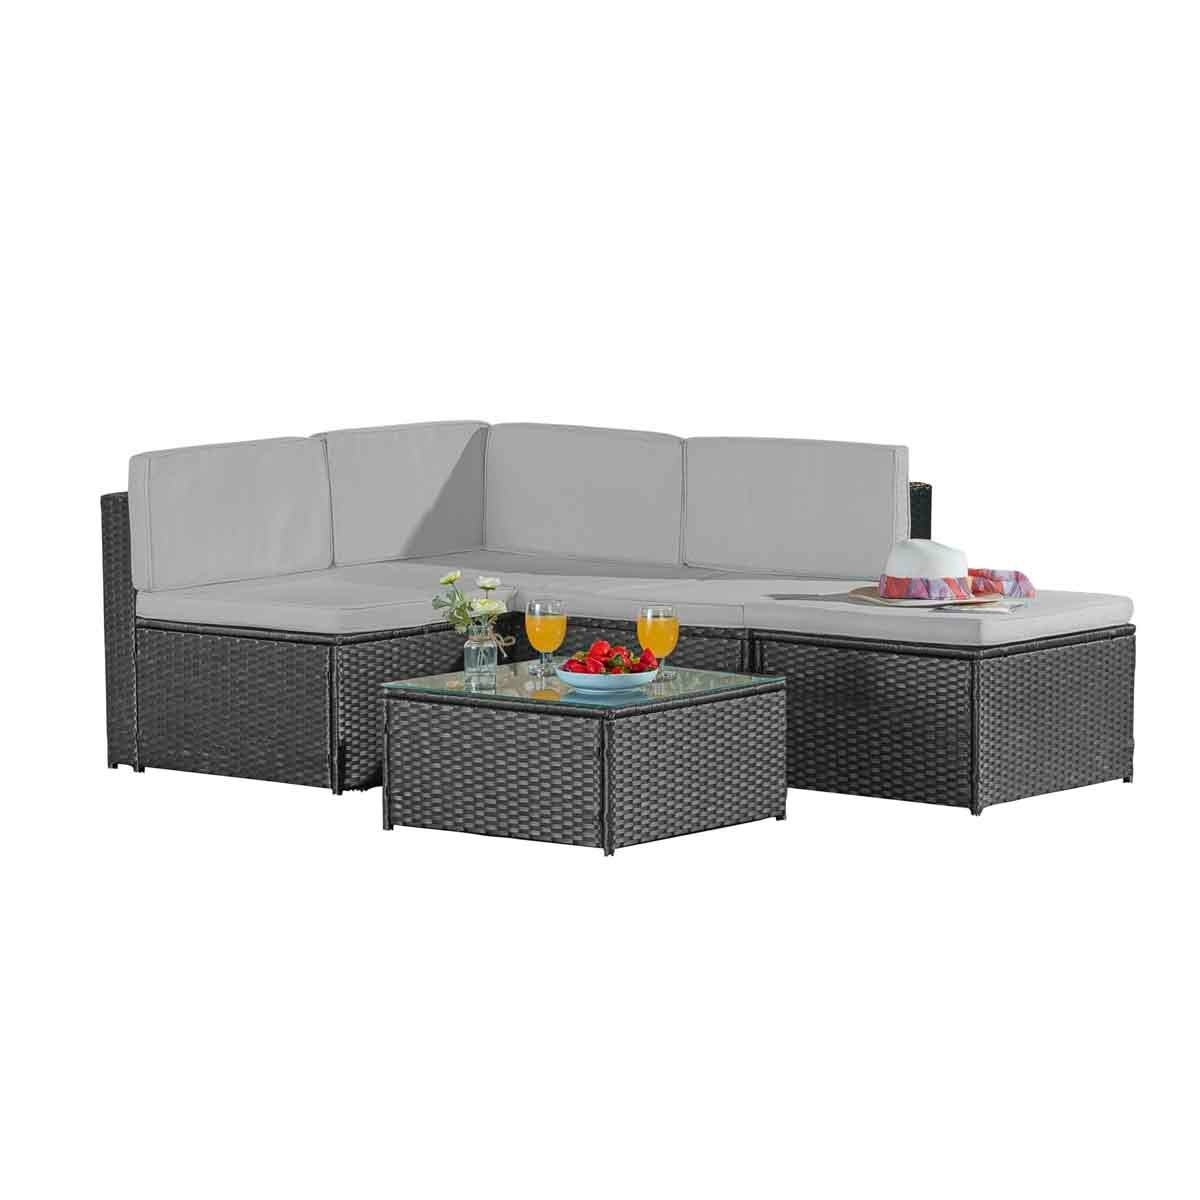 Garden Gear Milan Rattan Lounge Sofa Set - Grey